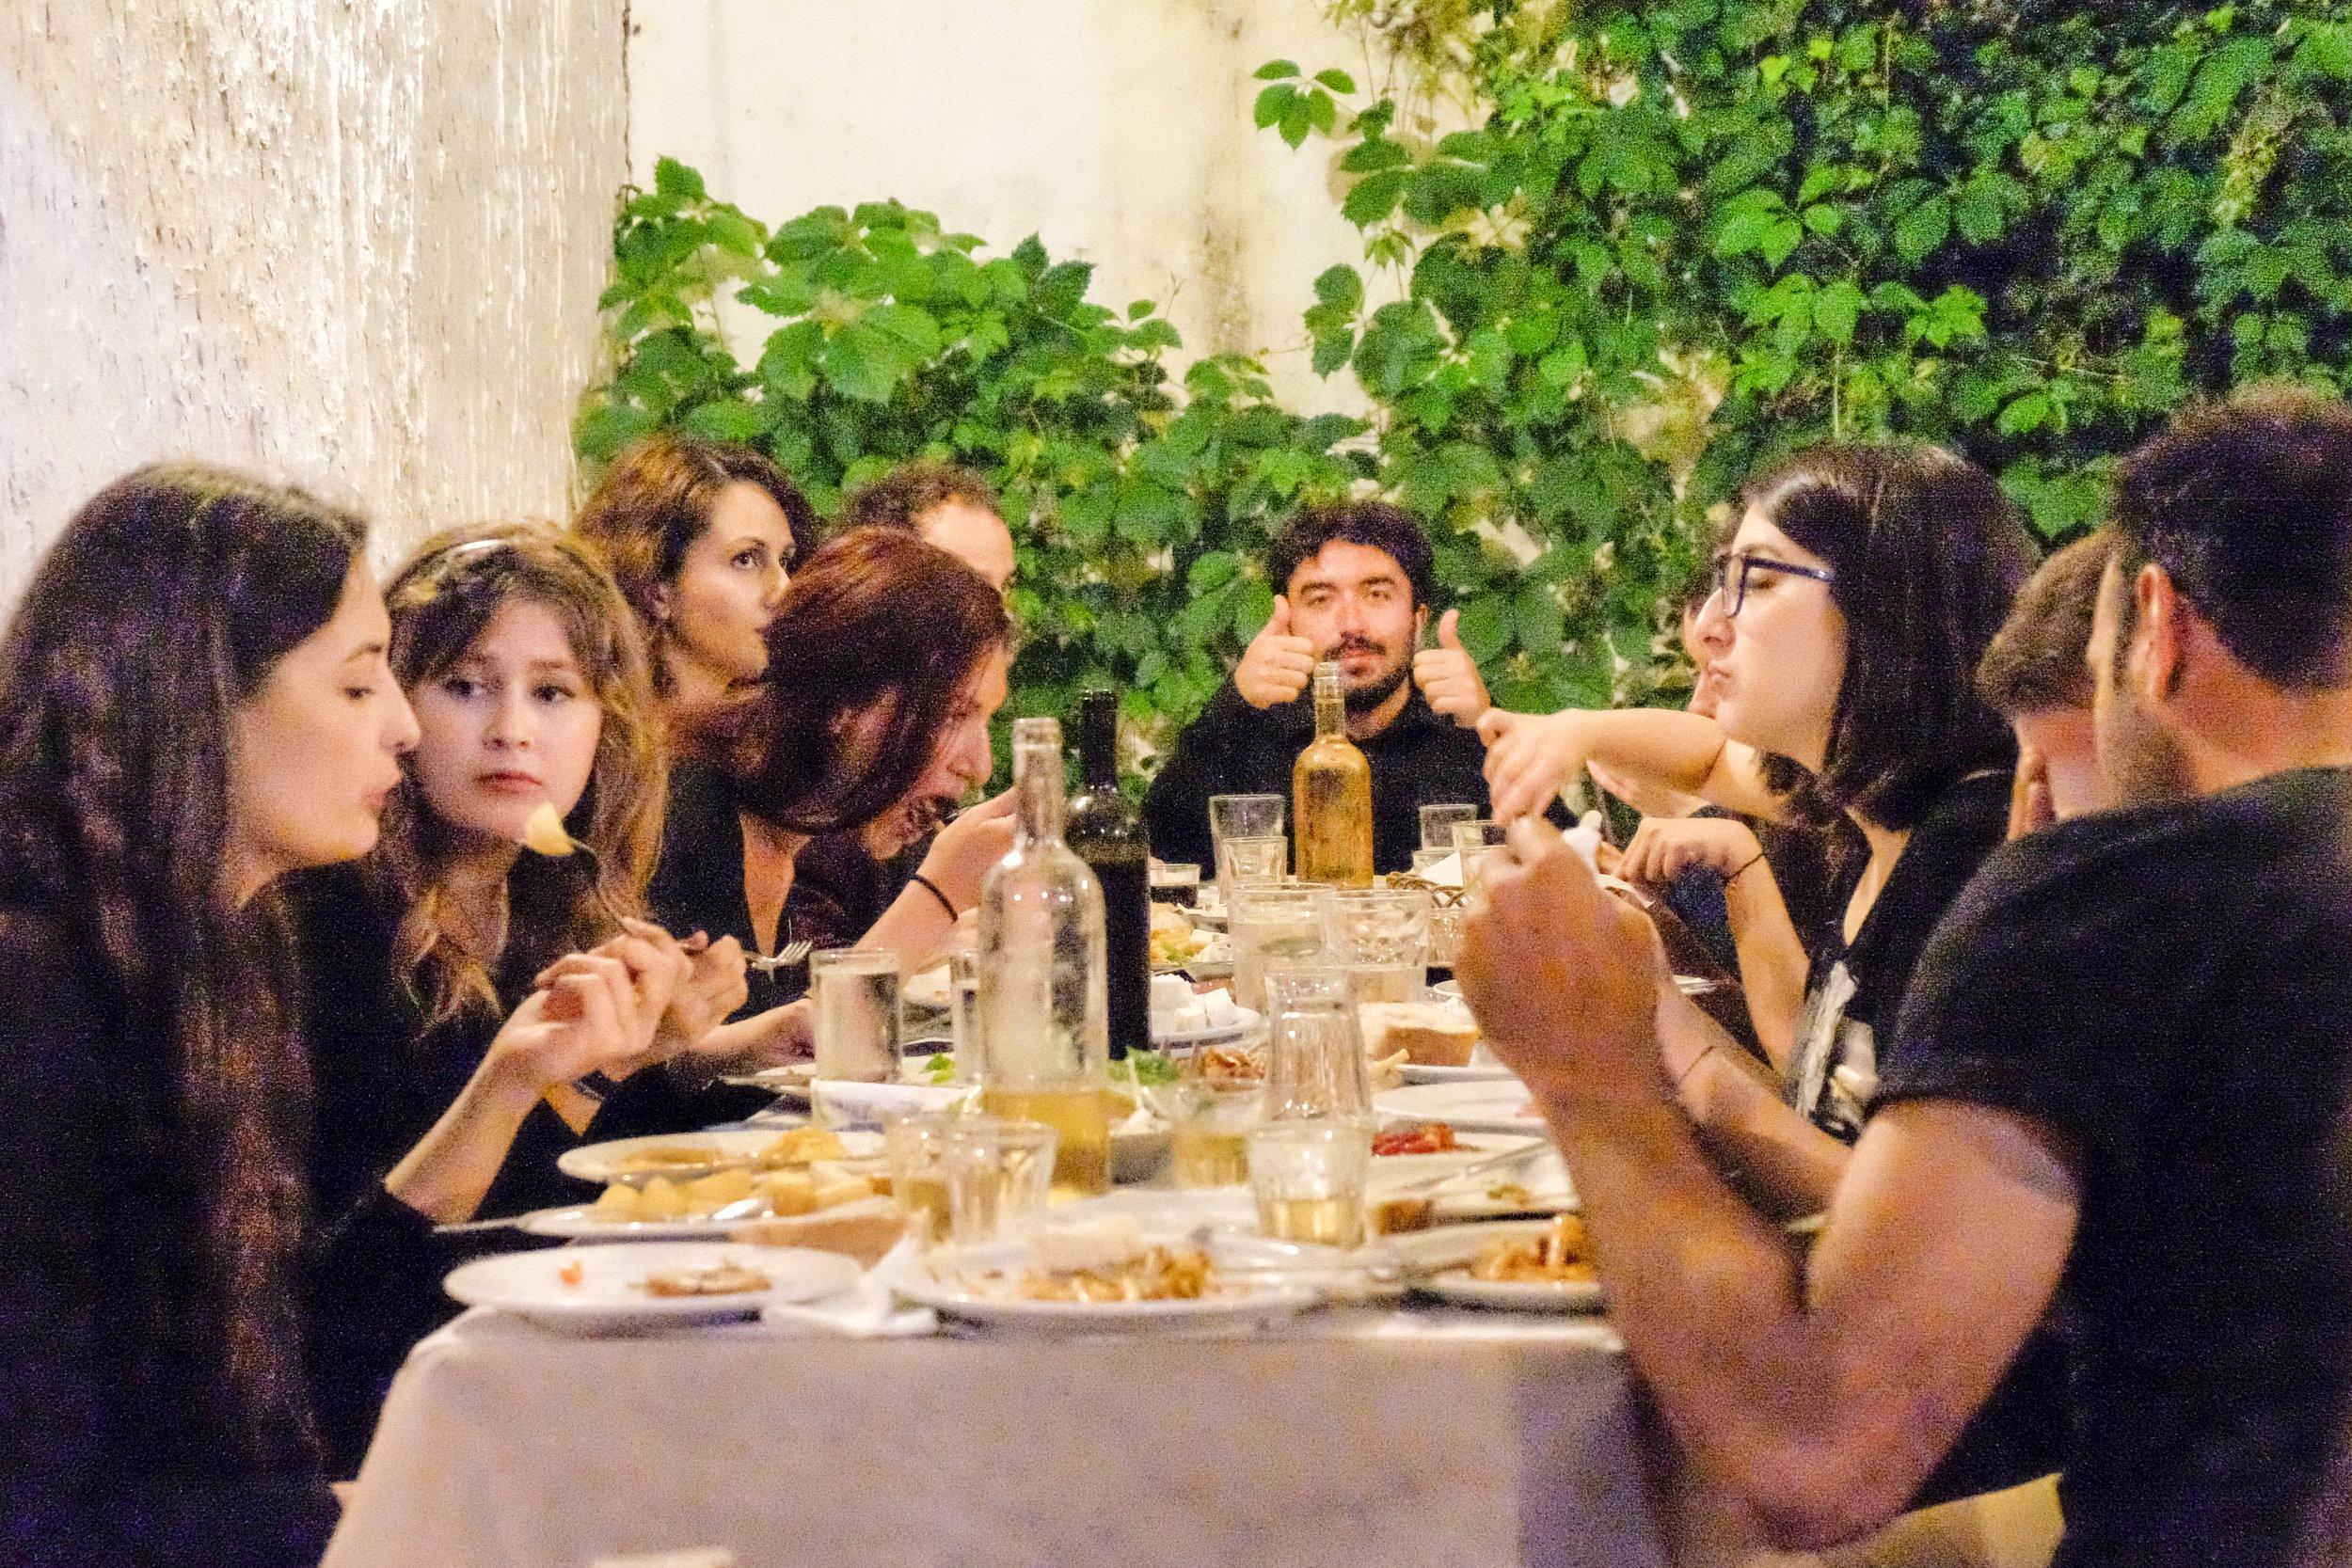 A group of friends enjoys dinner in taverna trips garden patio